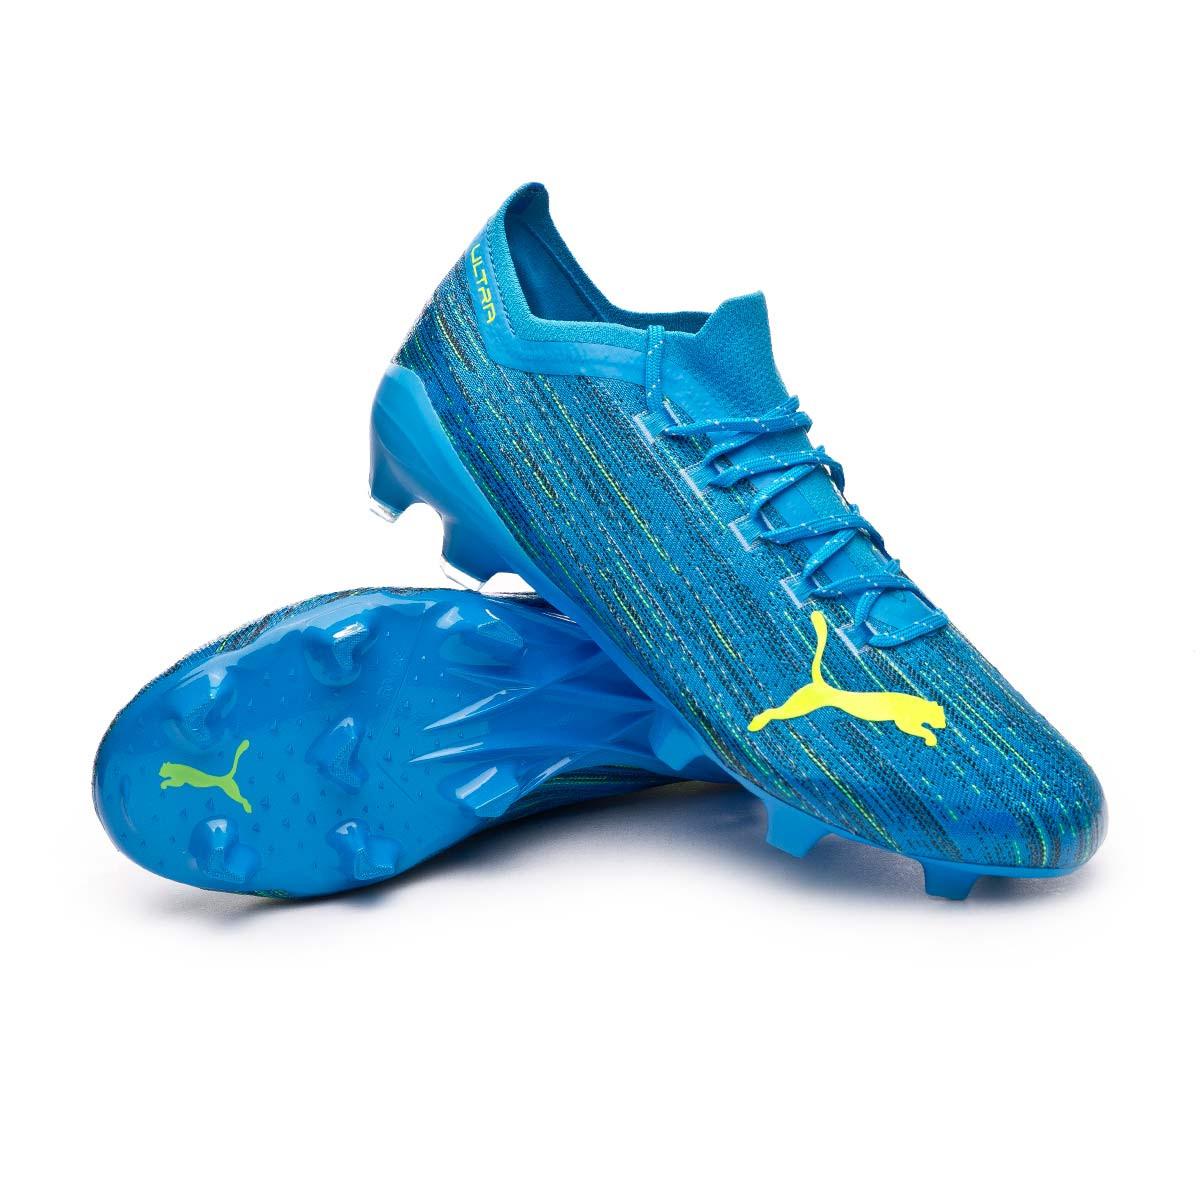 Football Boots Puma Ultra 1.2 FG/AG Nrgy Blue-Yellow Alert ...